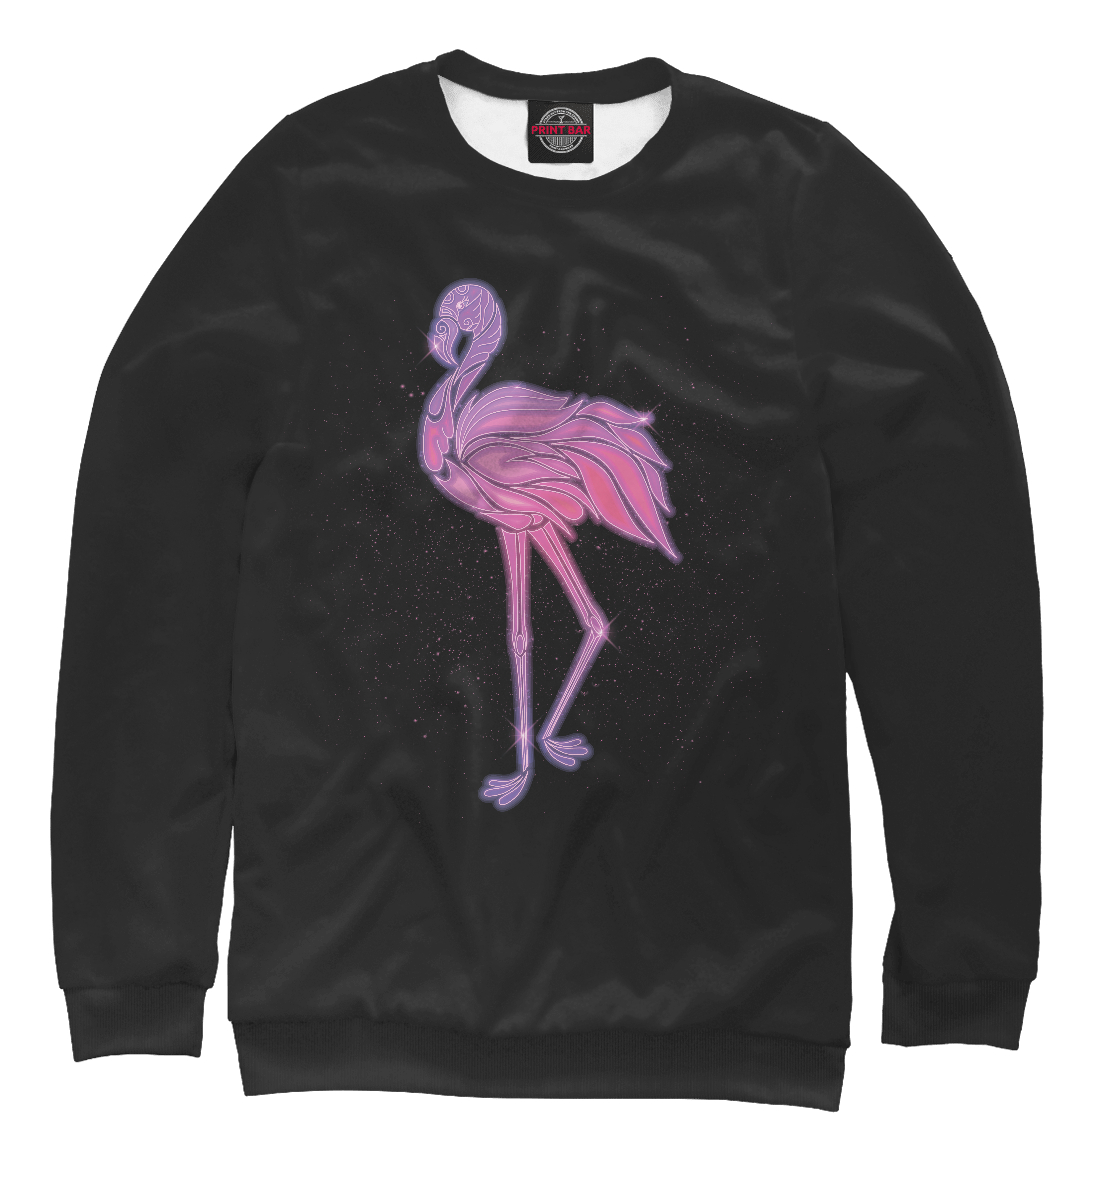 Розовый фламинго, Printbar, Свитшоты, PTI-348678-swi-1  - купить со скидкой